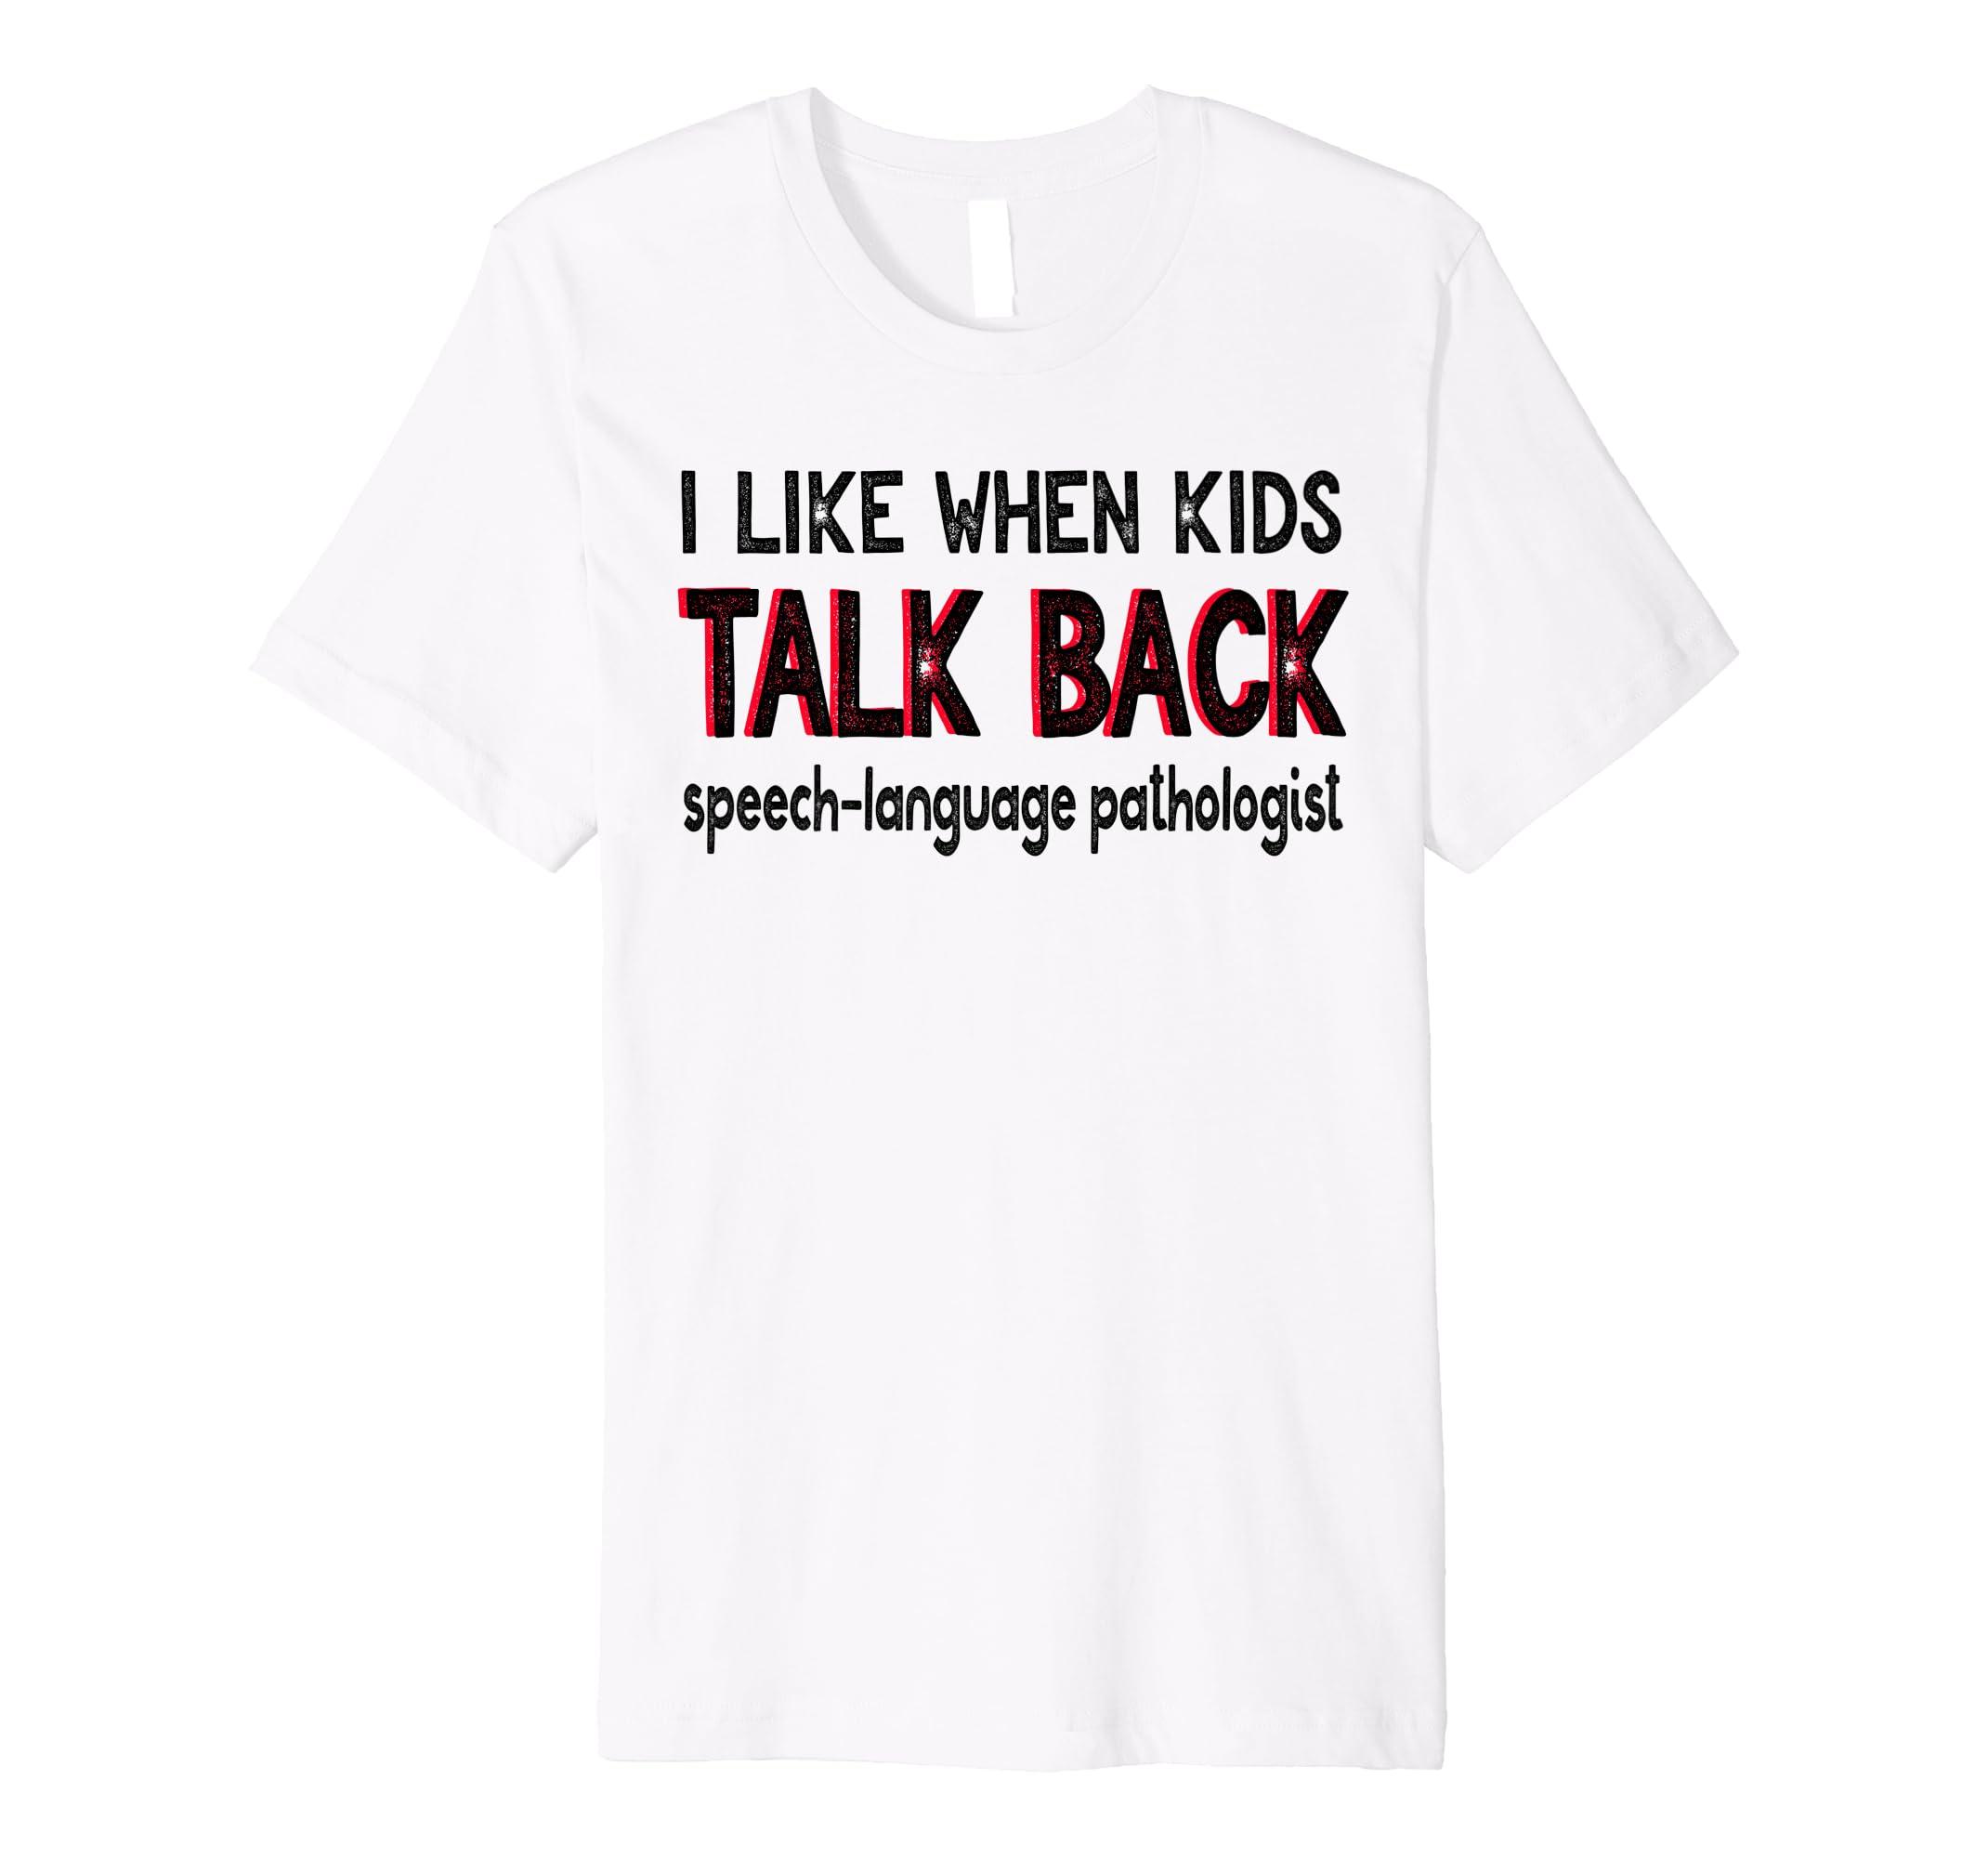 b18452094 Amazon Com Funny Speech Pathologist Shirt For School Slp Therapist